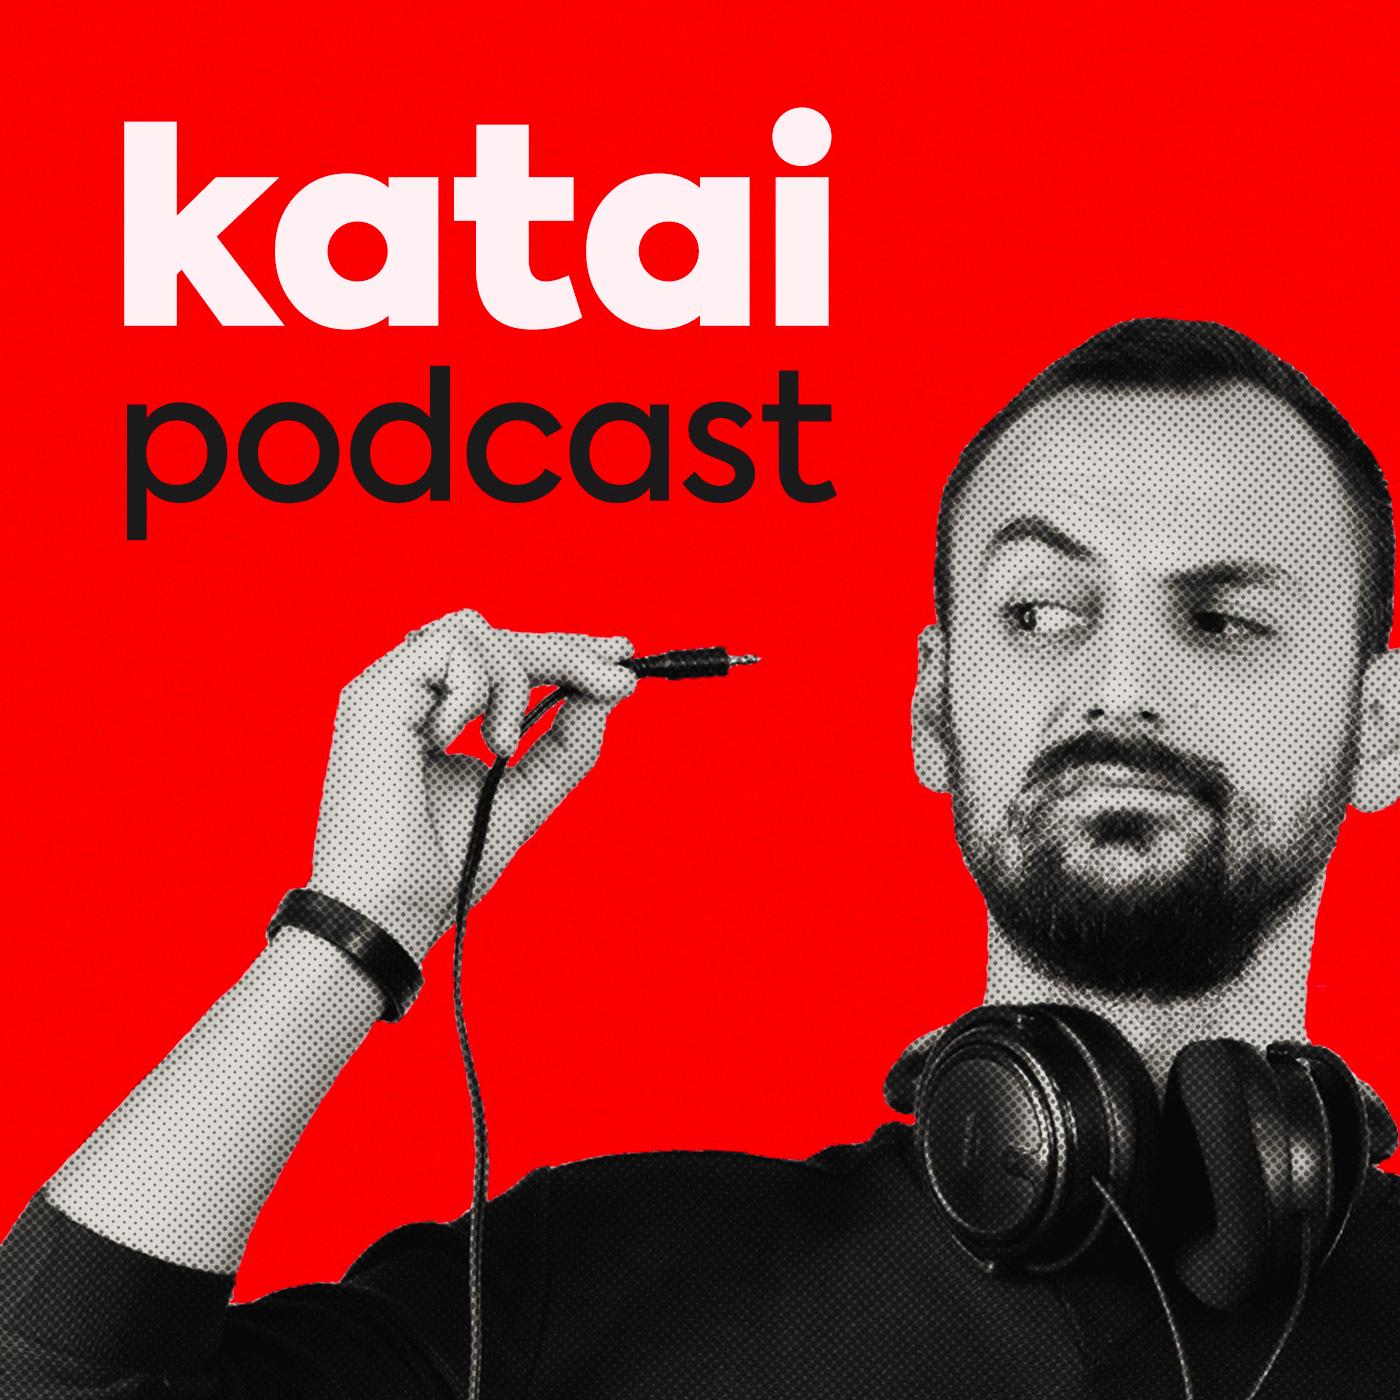 Katai Podcast show art